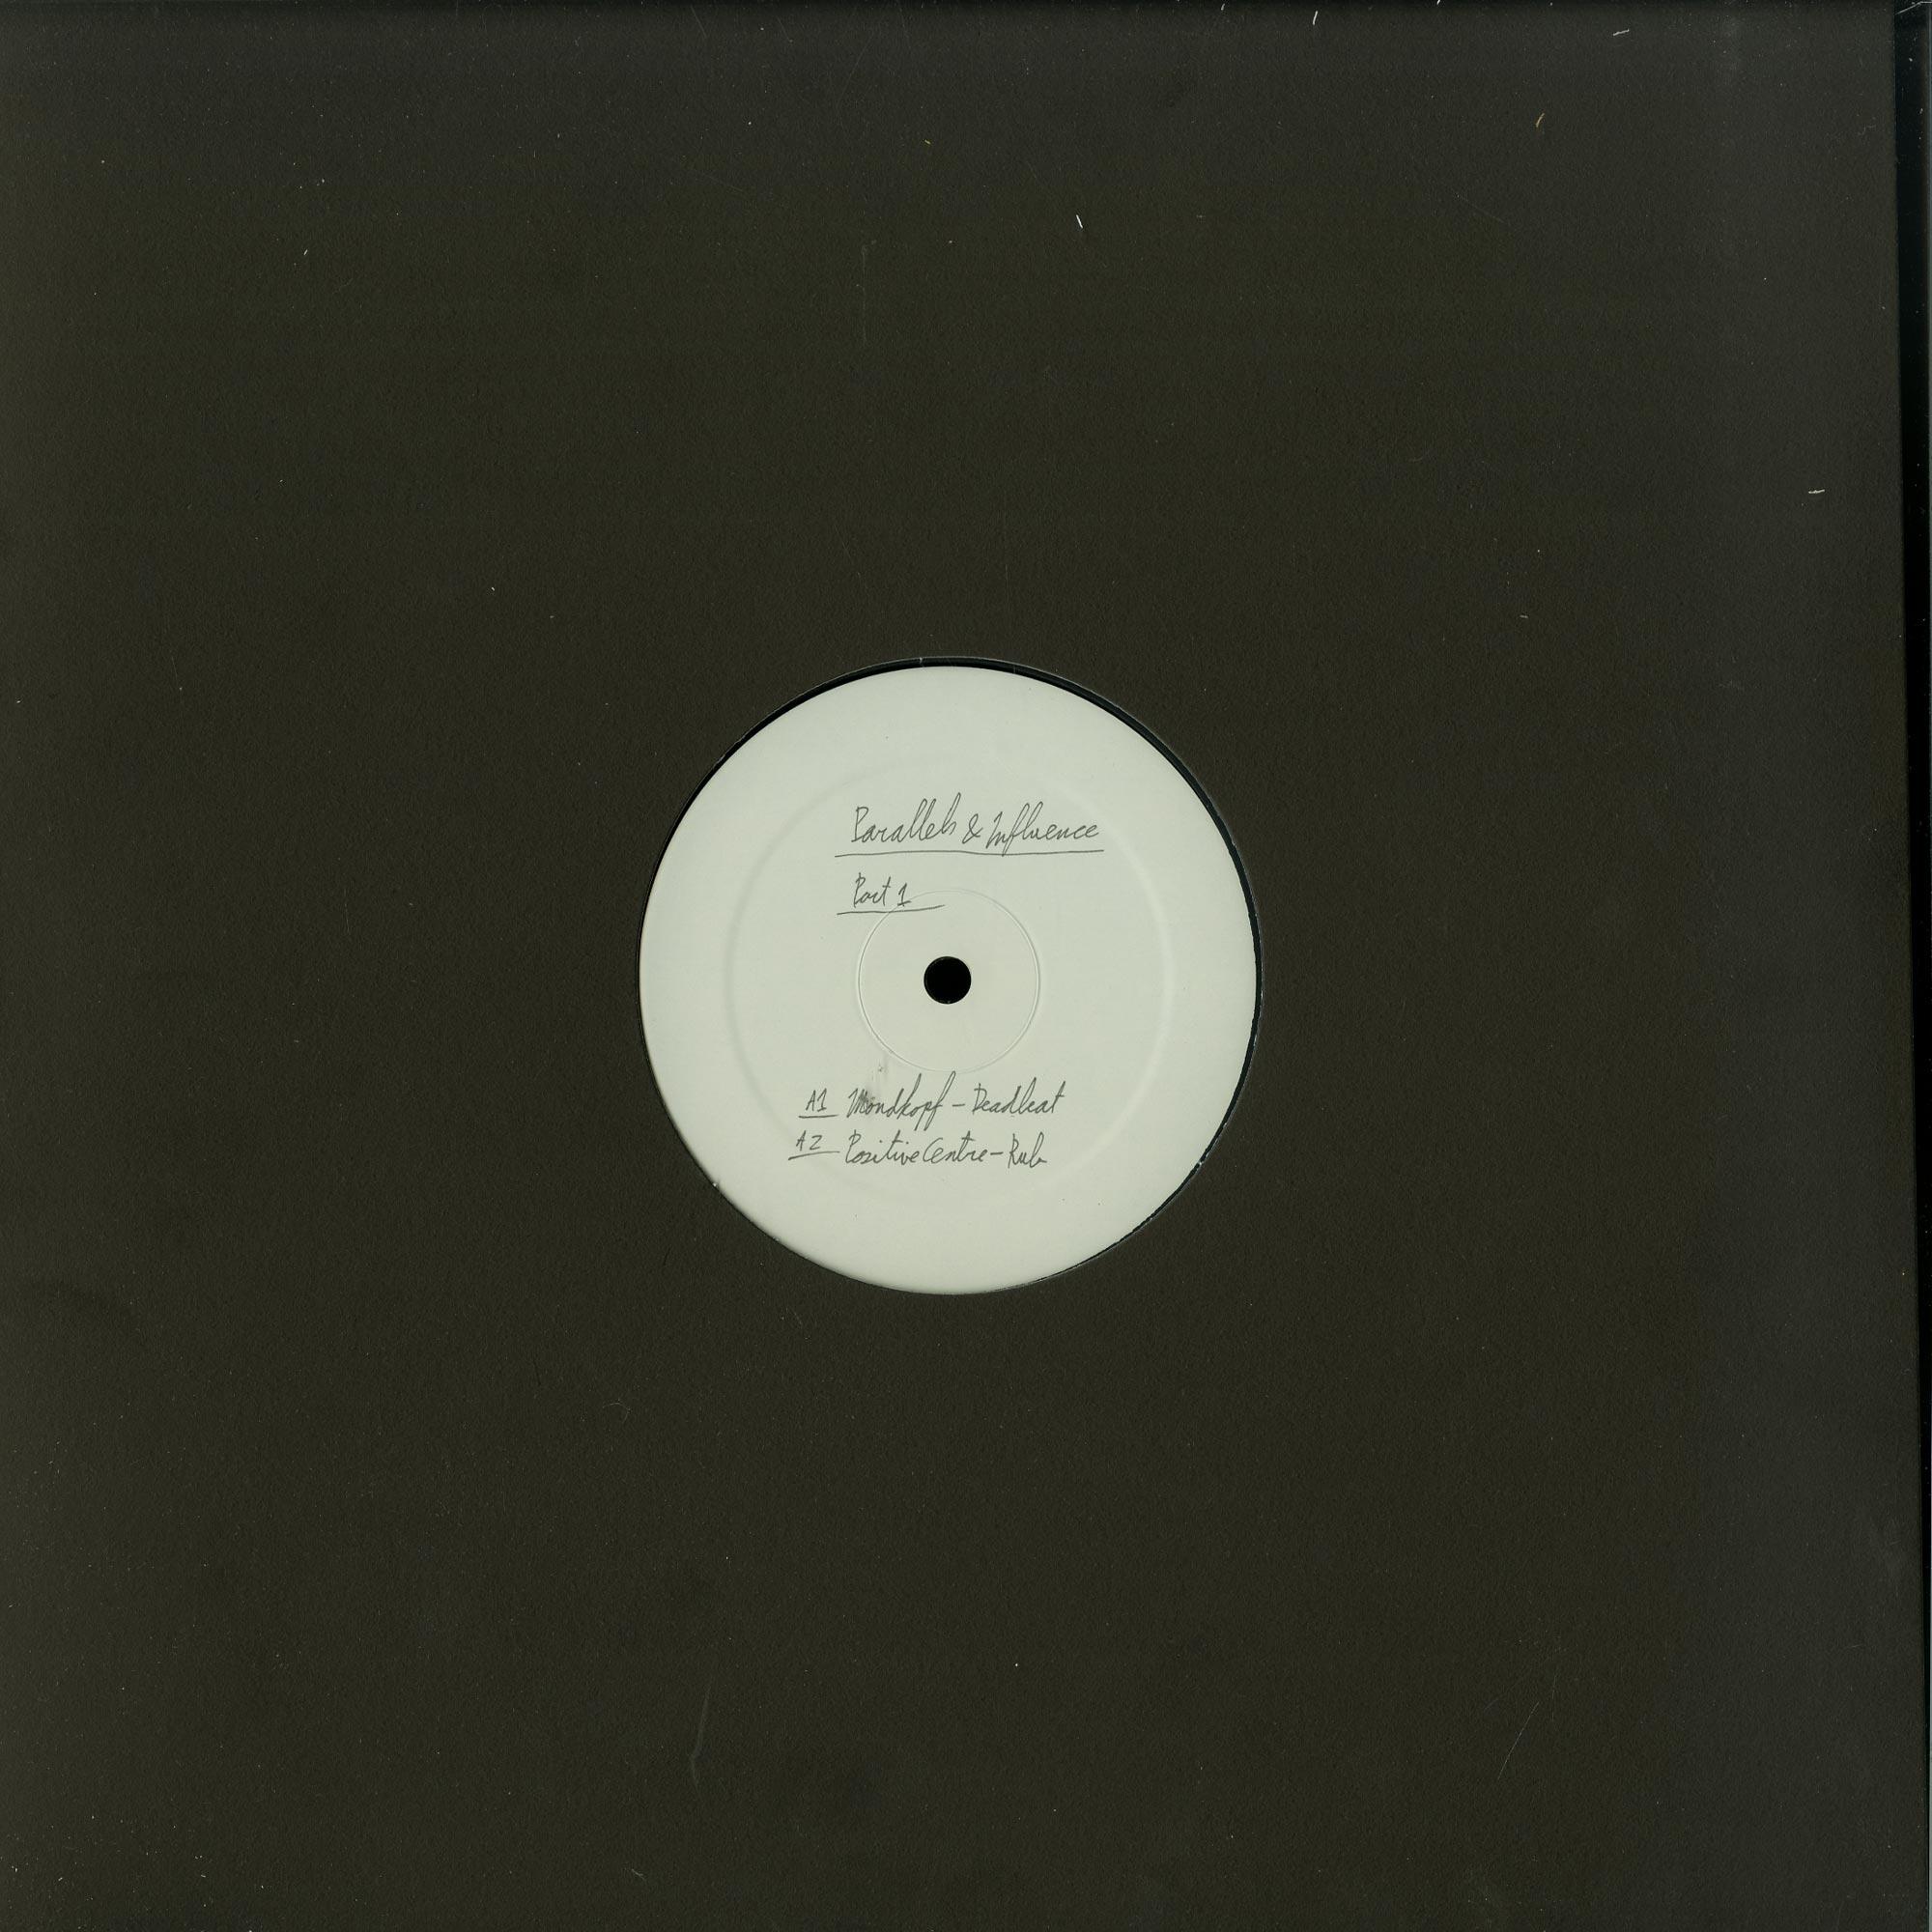 Mondkopf, Positive Centre, Codex Empire, Yuji Kondo - PARALLELS INFLUENCES PART 1 EP